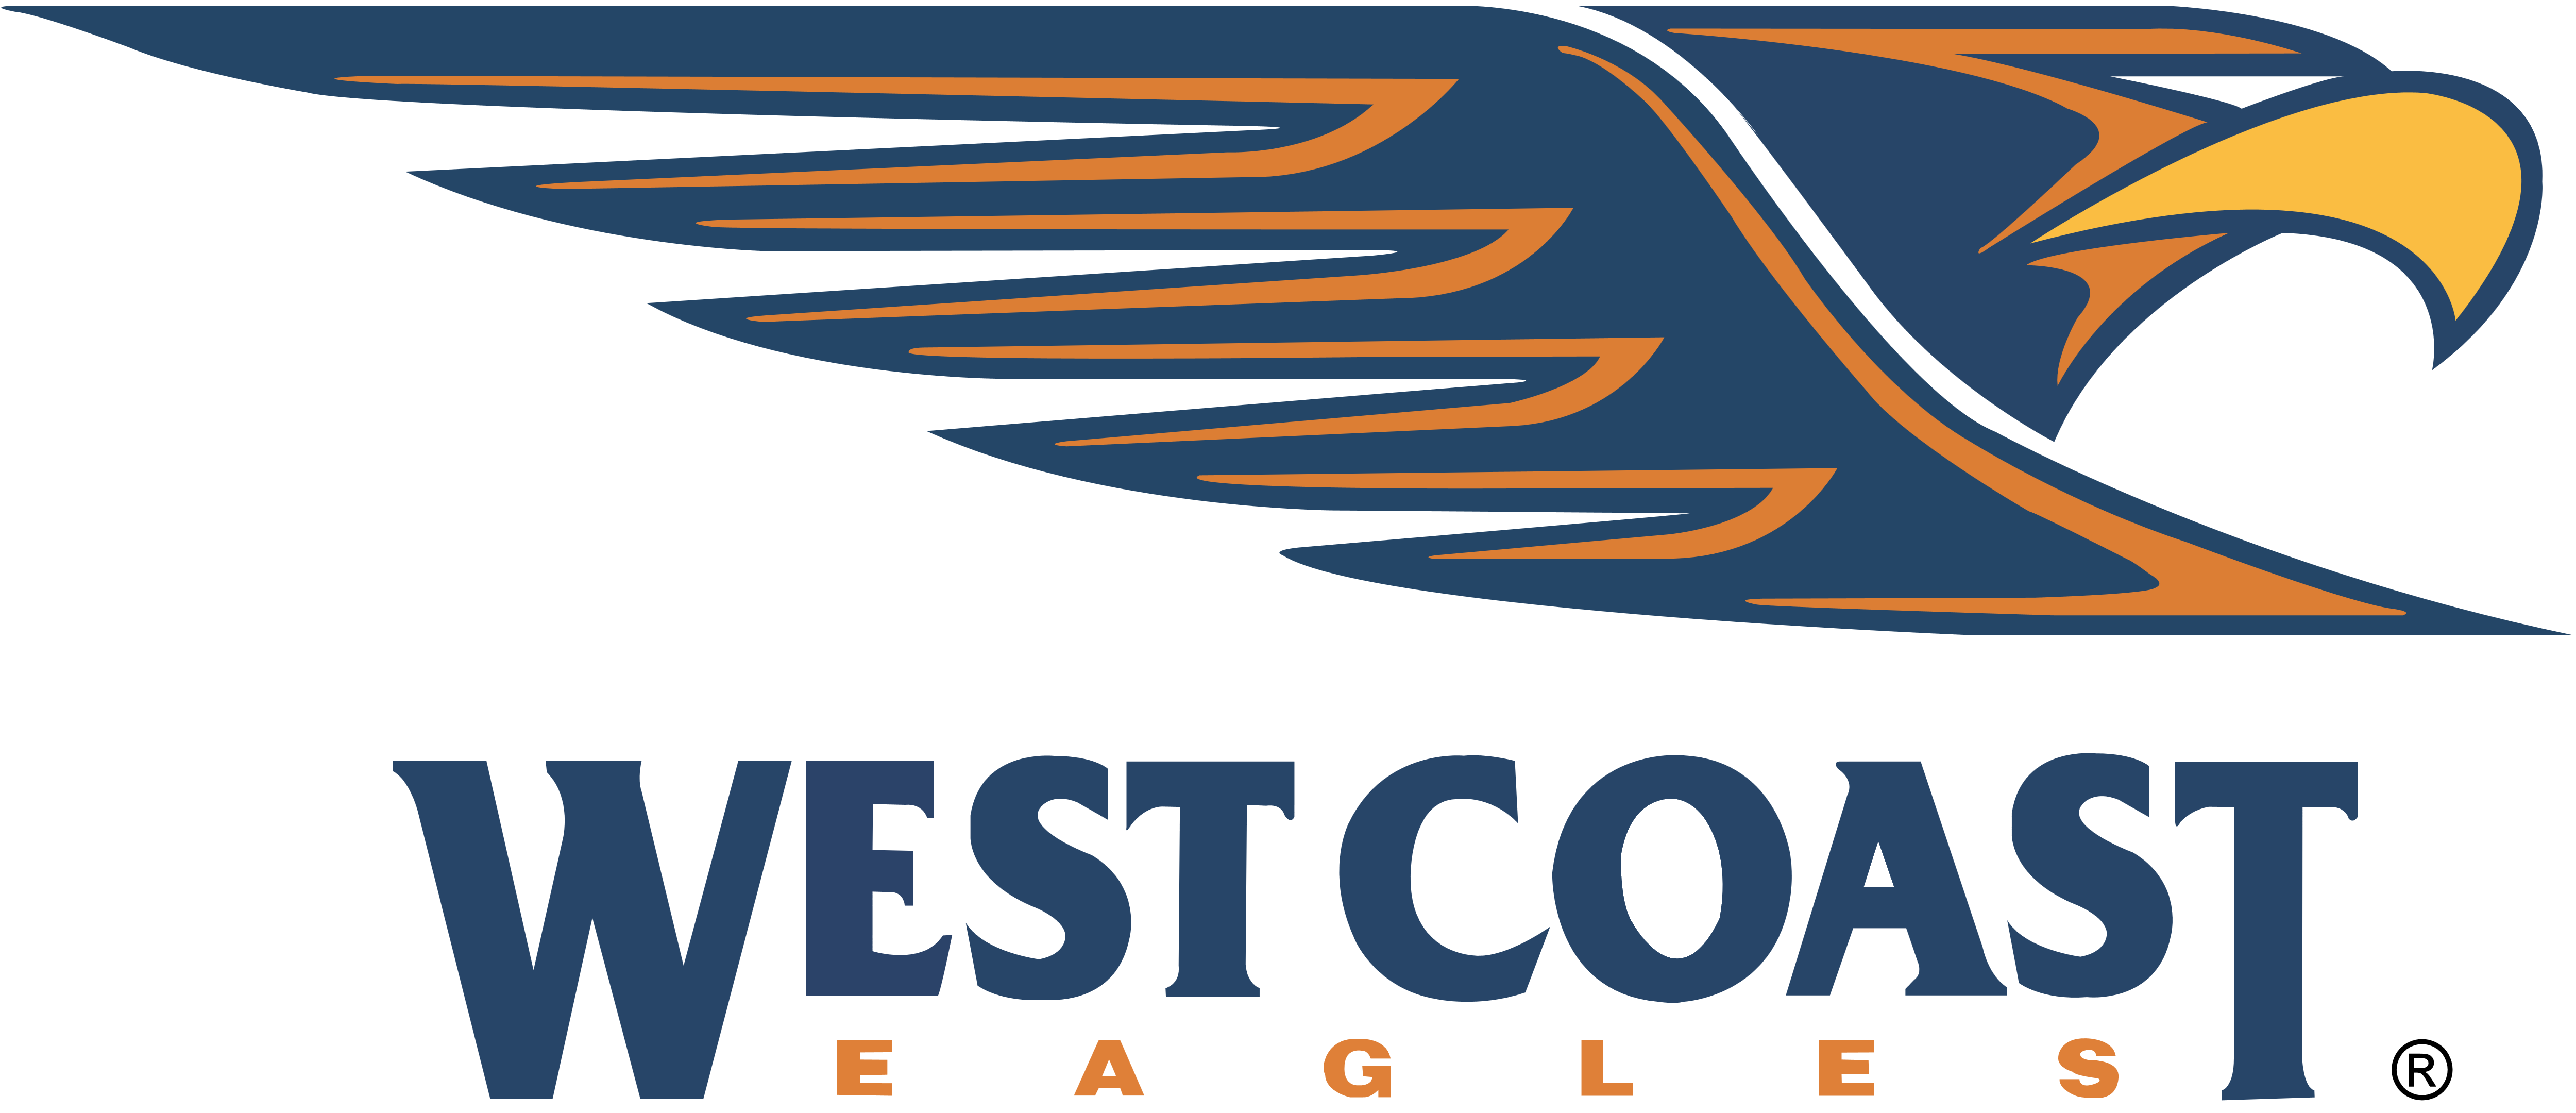 West Coast Eagles FC u2013 Logos Download